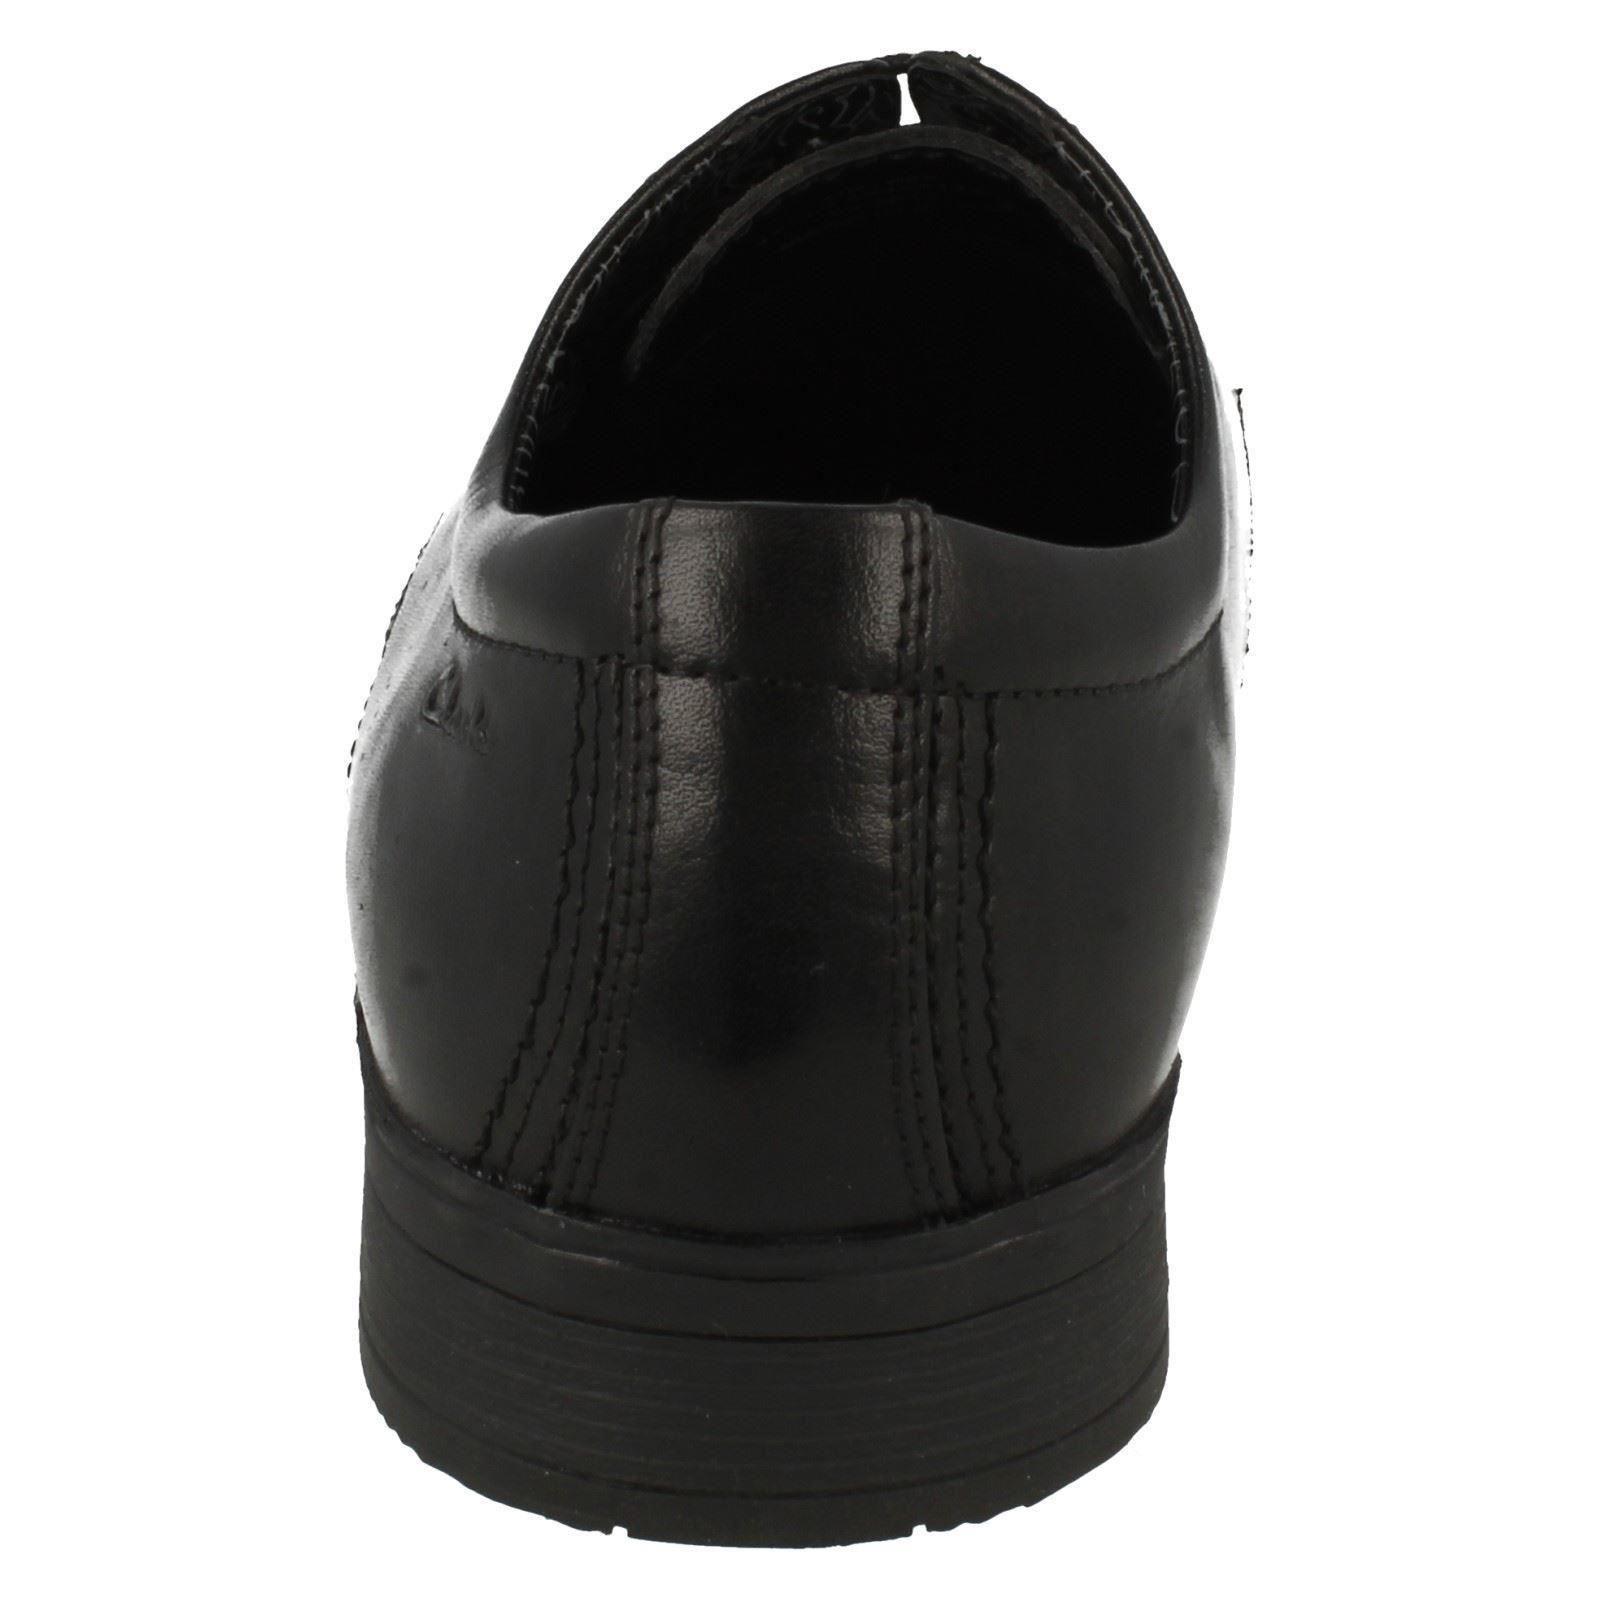 Herren Clarks Schnürer Leder Formelle Schuhe Tag Aze Tag Schuhe 5dffd2